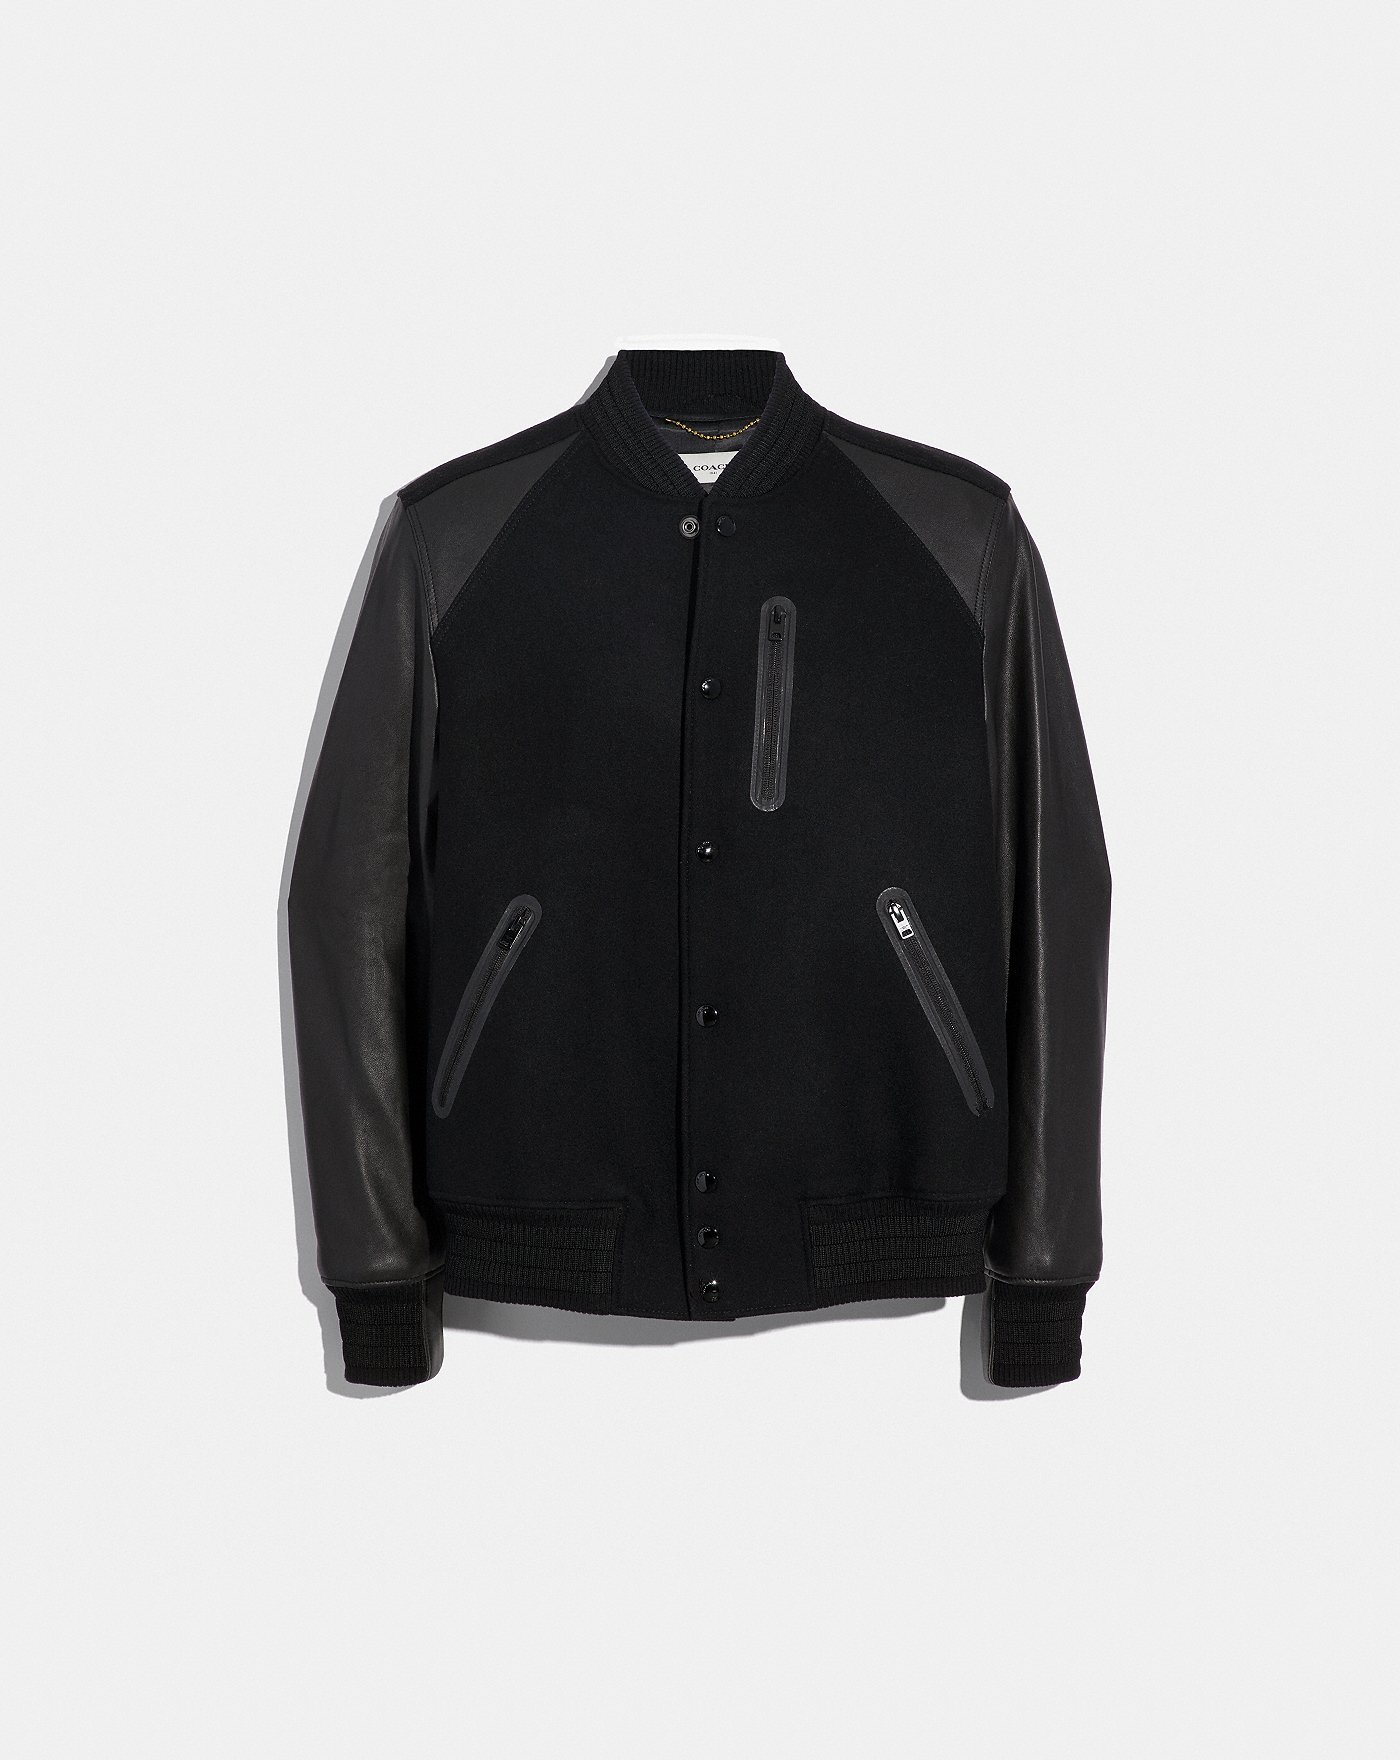 Design Your Own Letterman Jacket Online   Coach Rexy Varsity Jacket